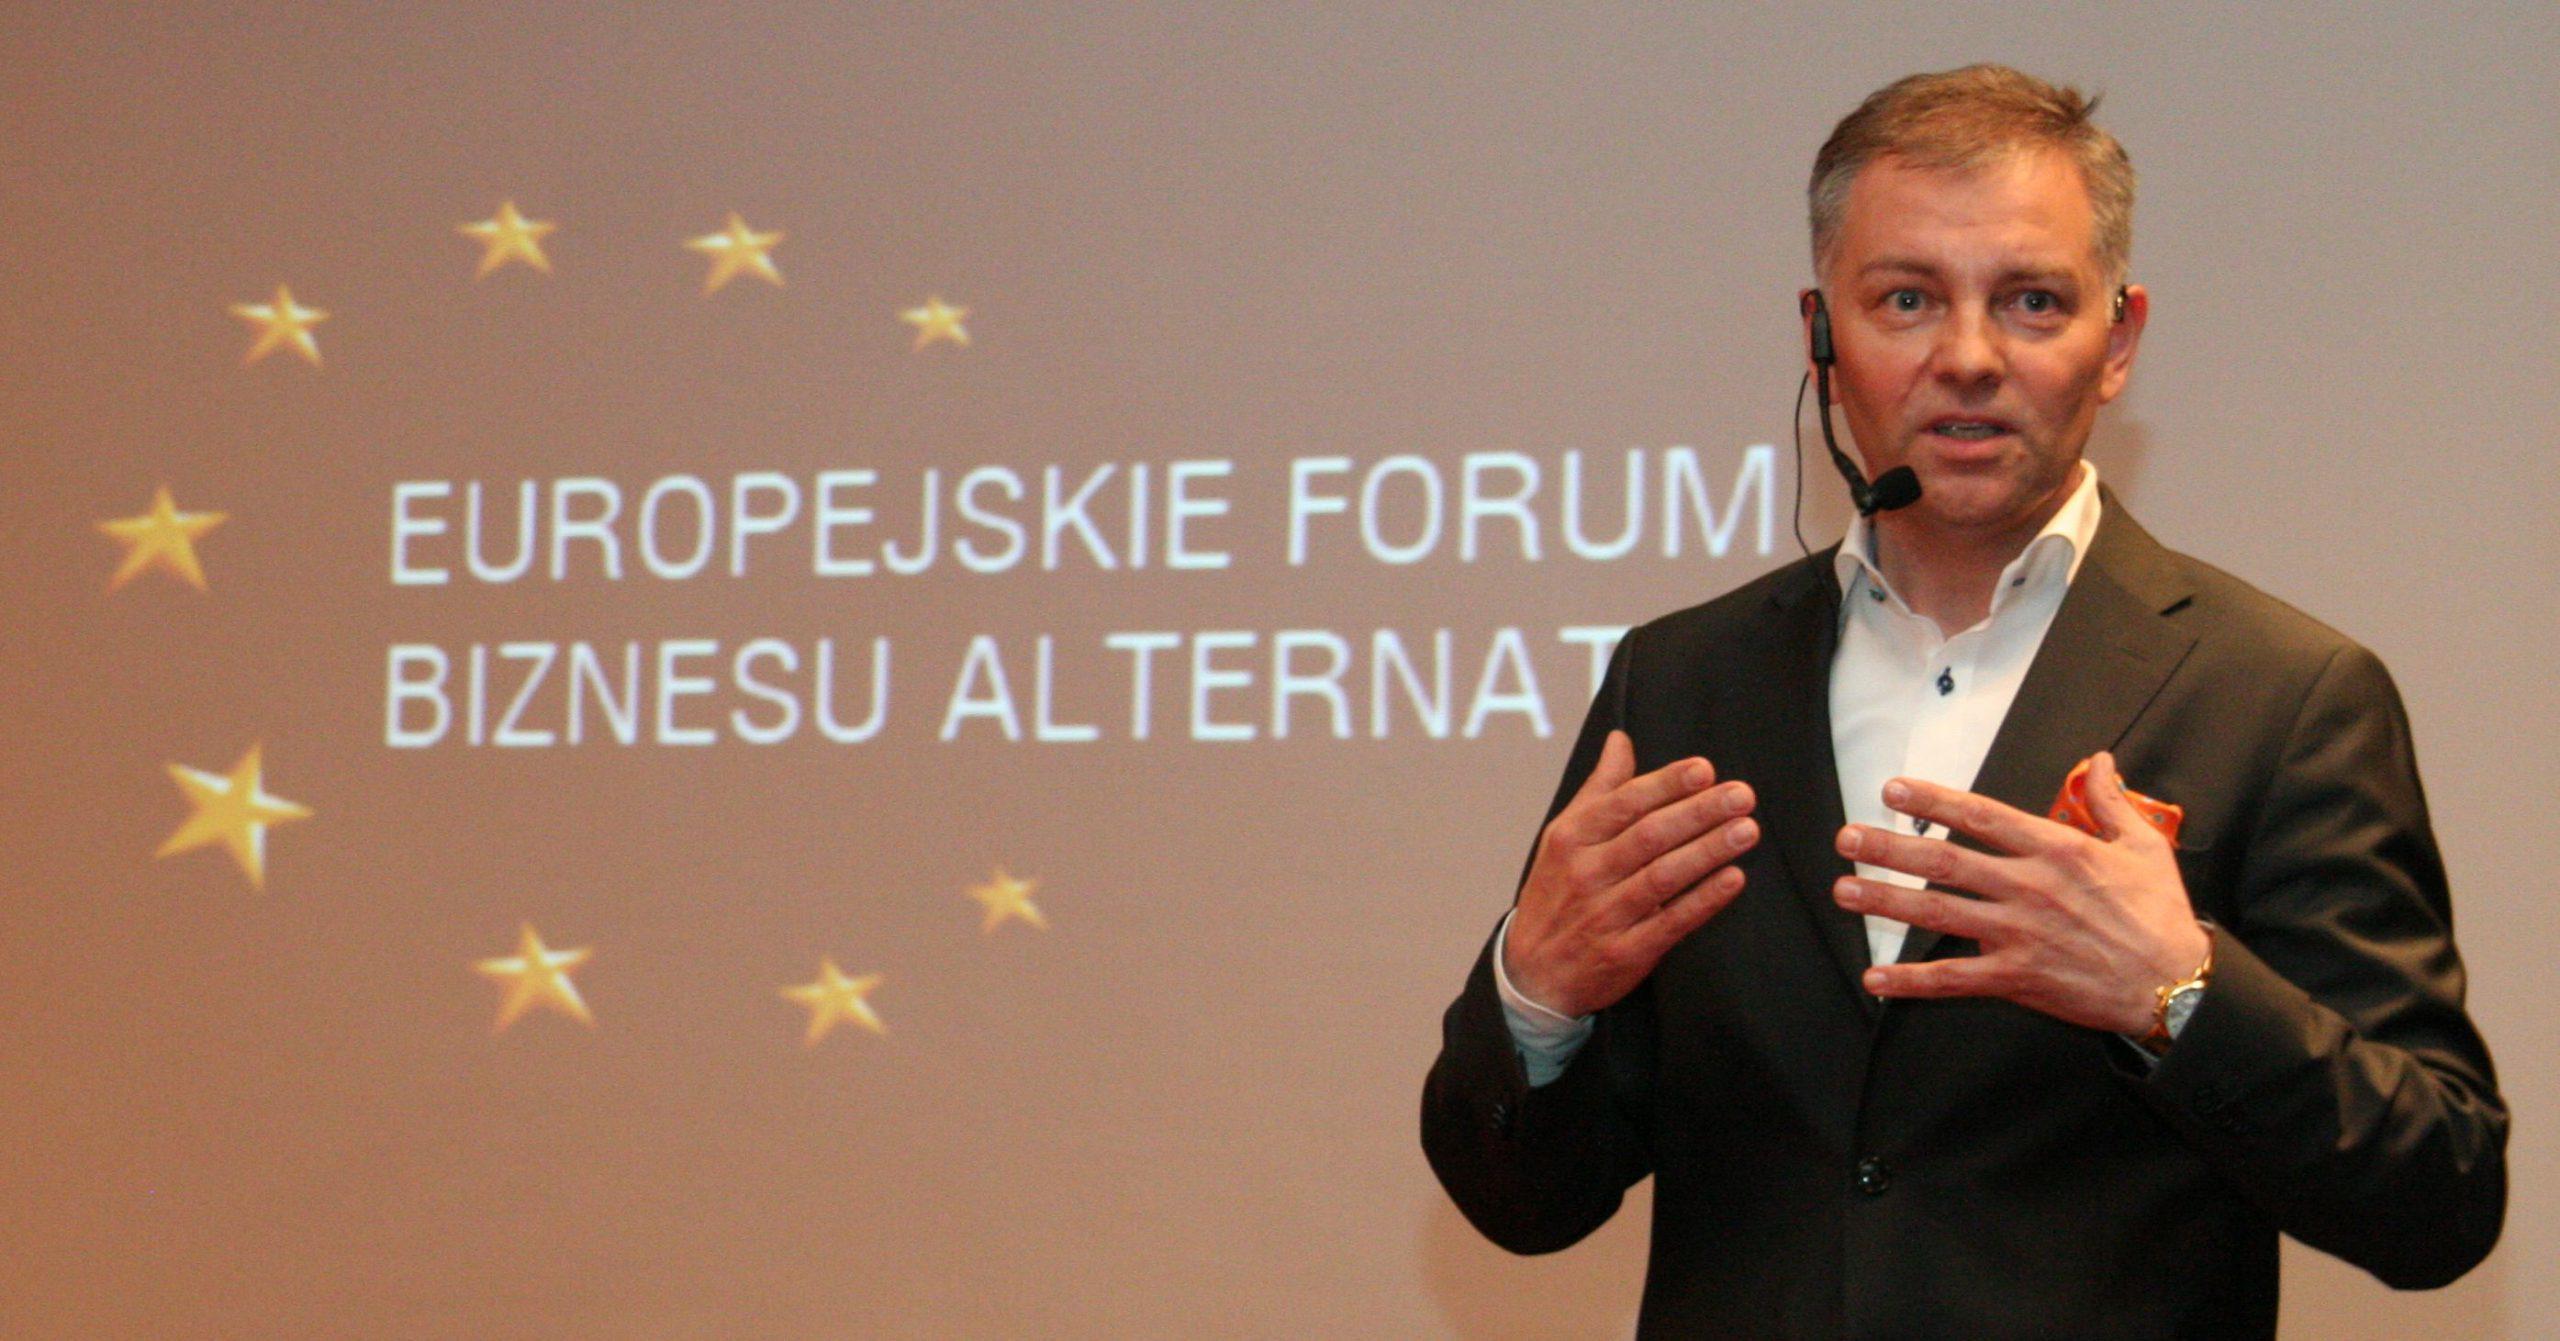 Paweł Borecki (EFBA 2014)